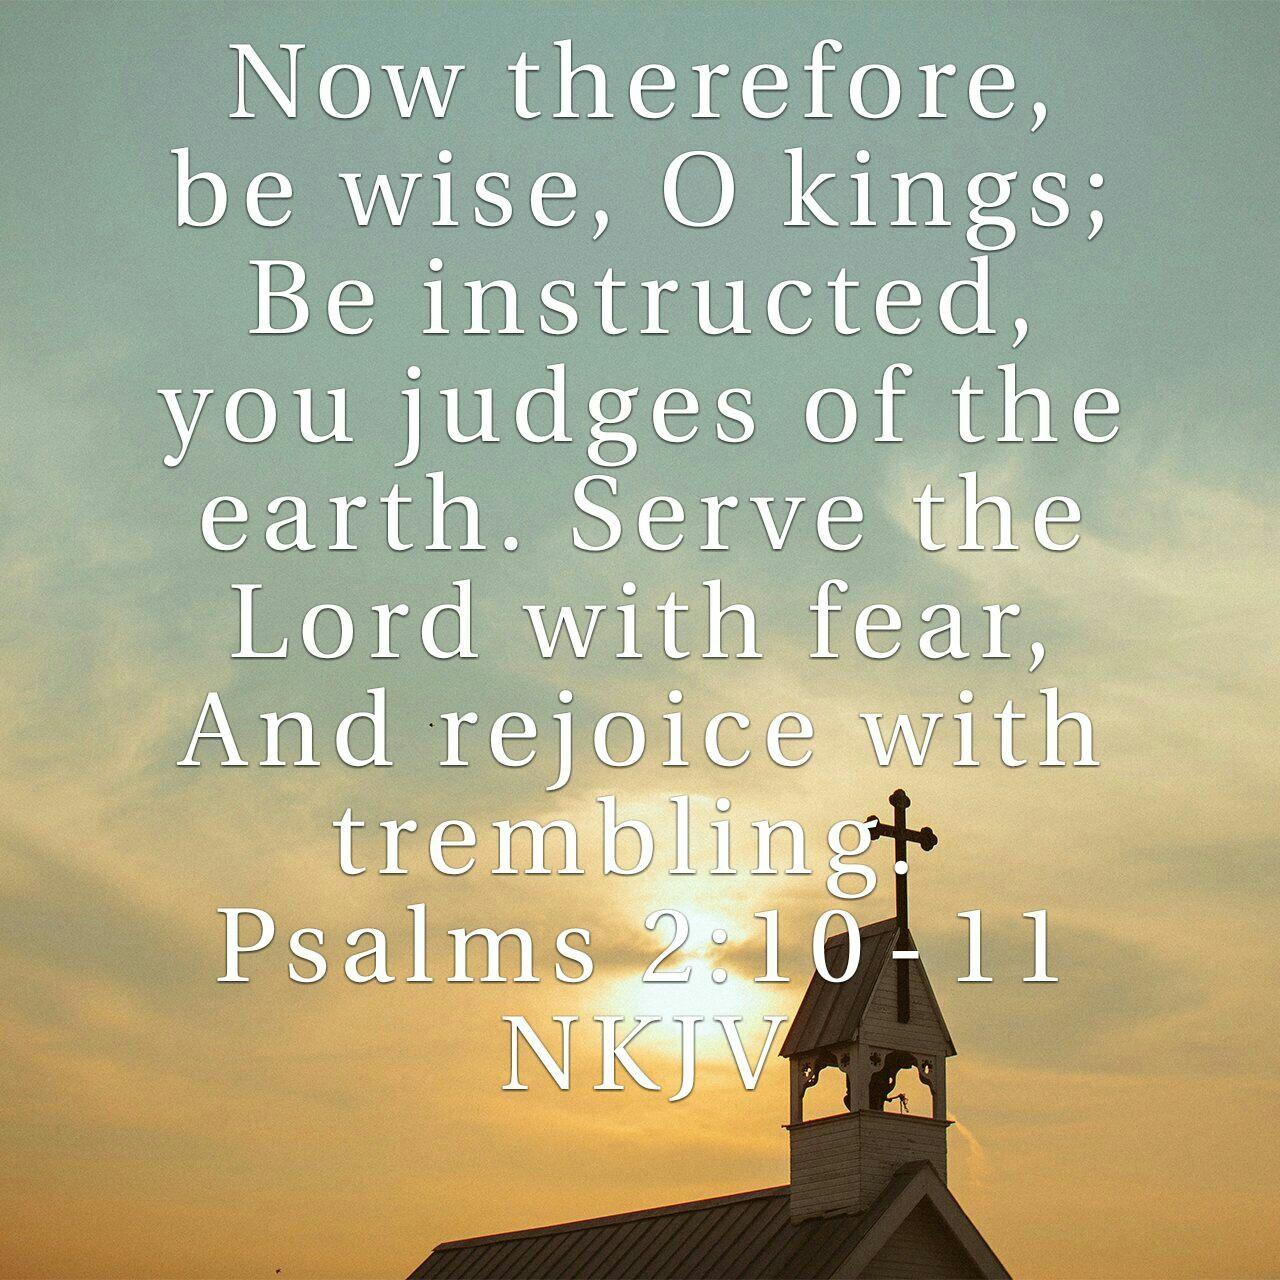 Psalm 2 10 11 Words 19 7 Nkjv